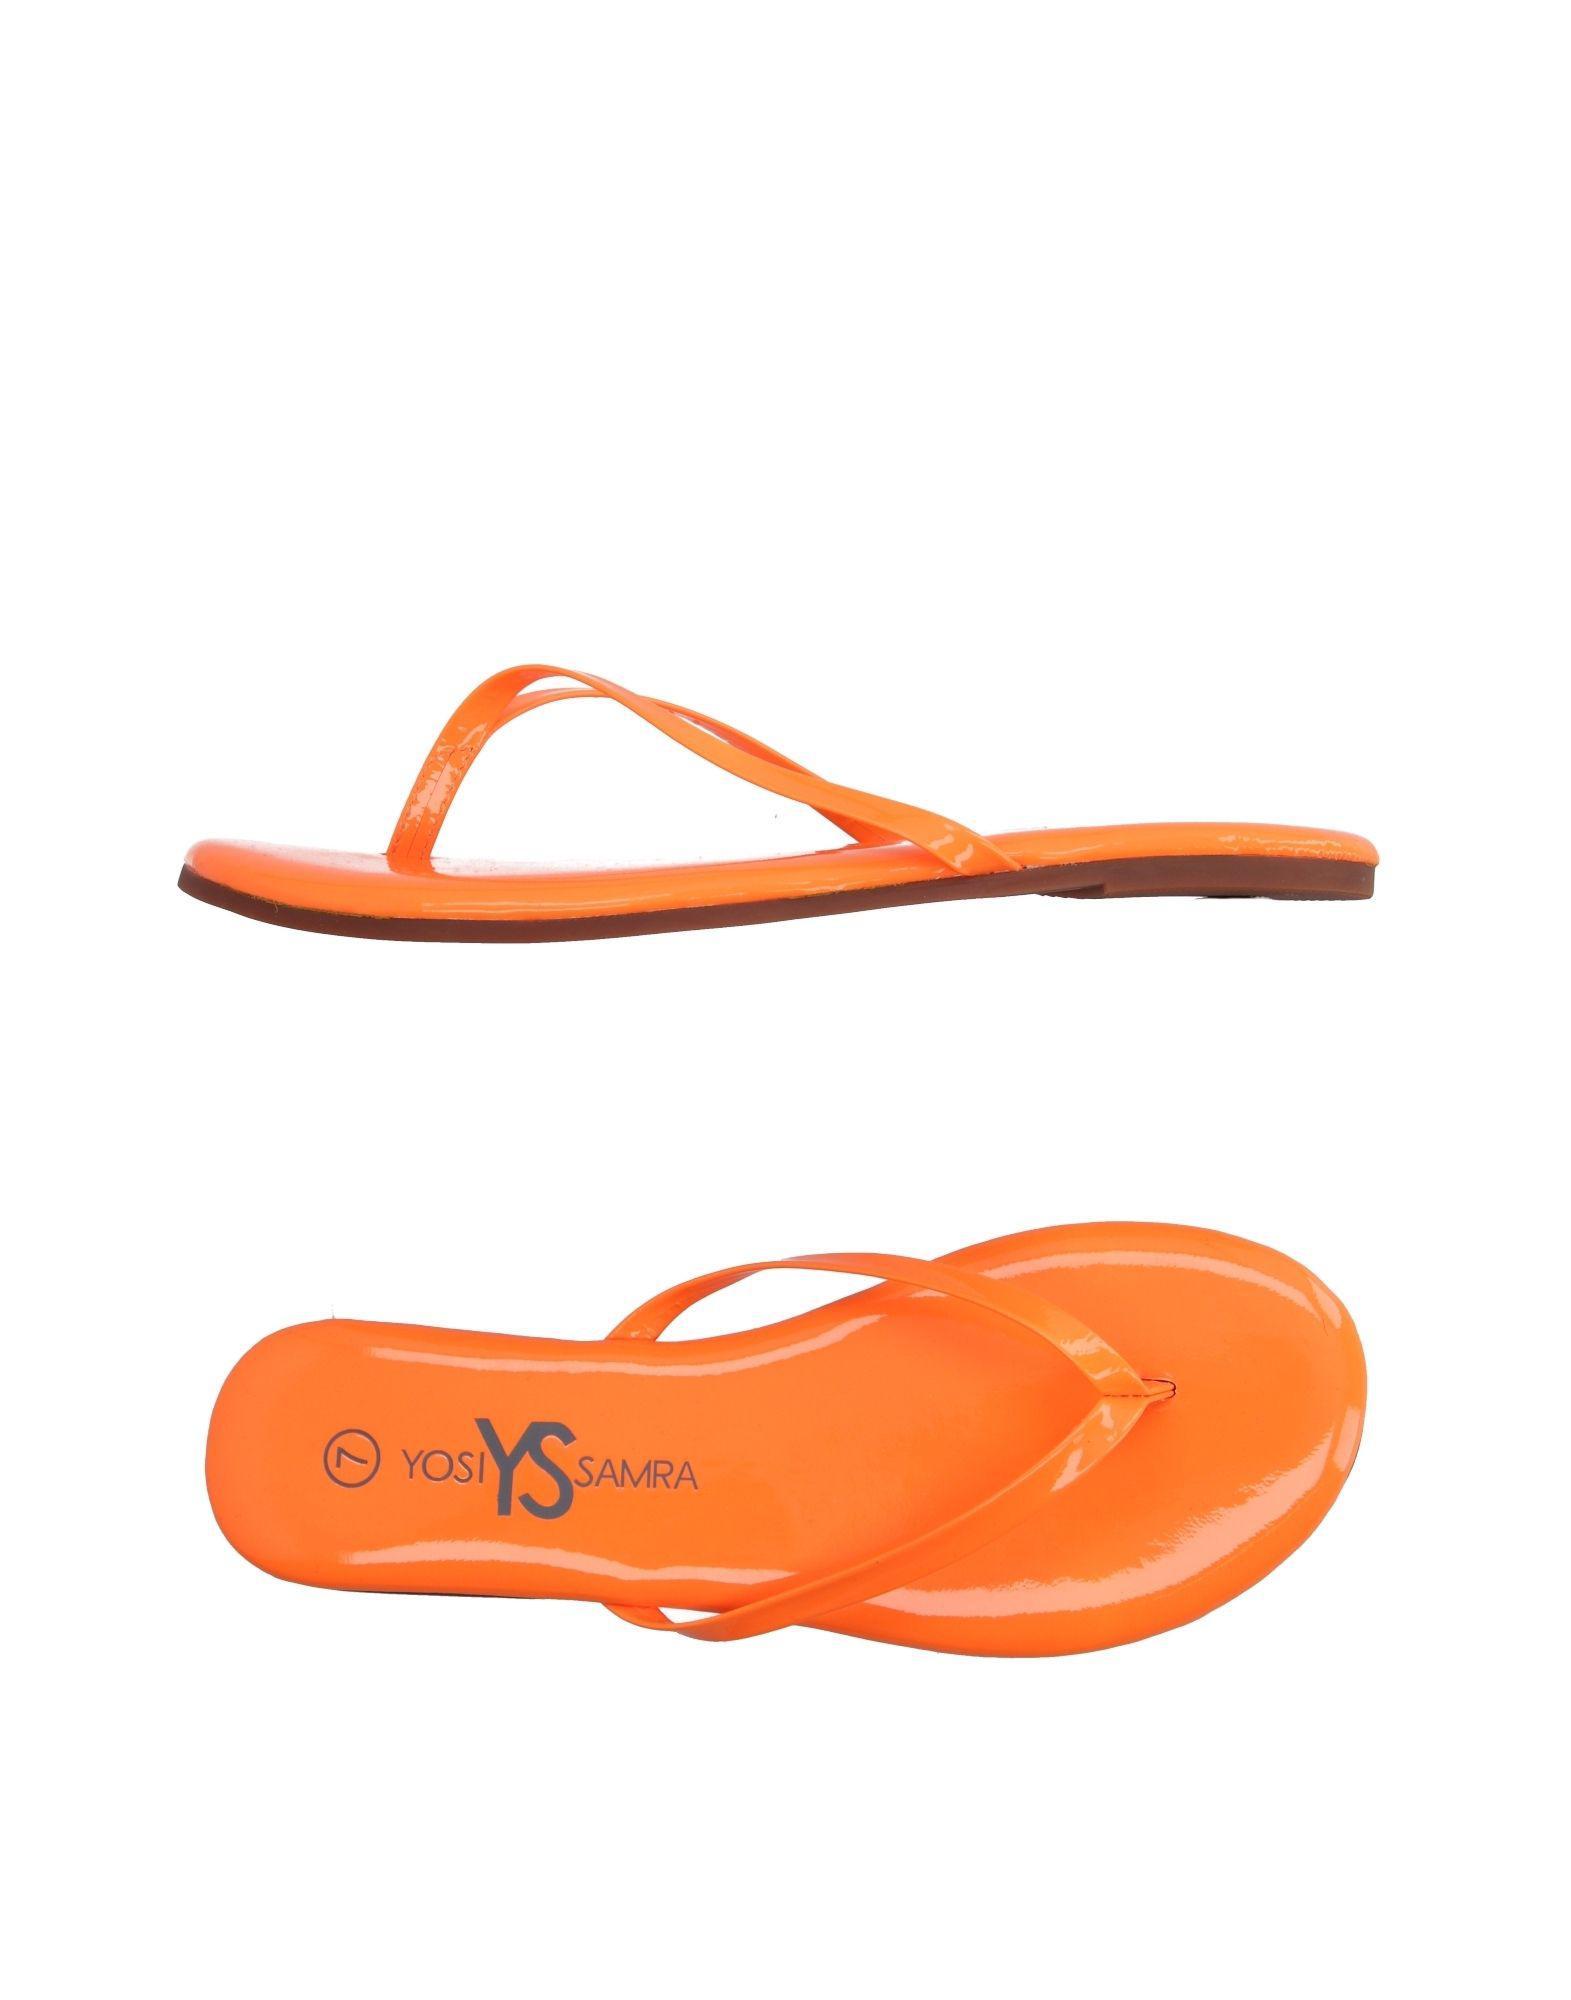 72433813a824c Yosi Samra Toe Post Sandal in Orange - Lyst